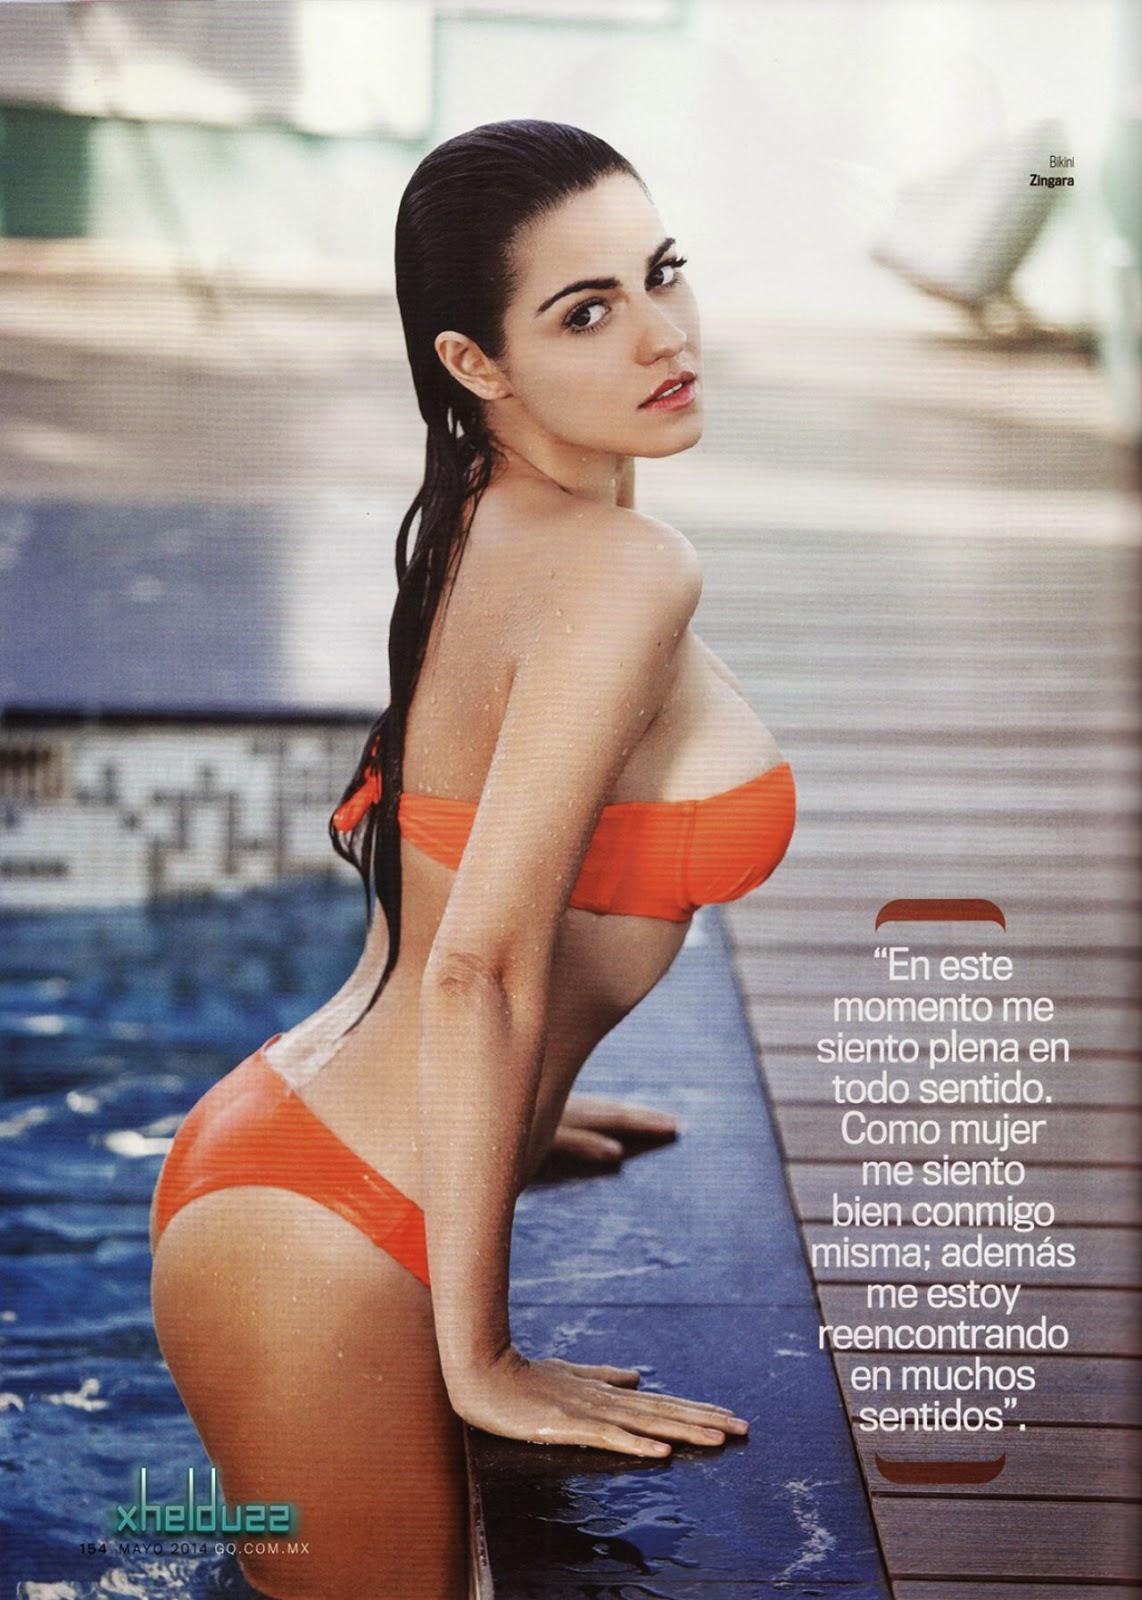 Maite Perroni Exposing Her Amazing Body In Bikini For Gq